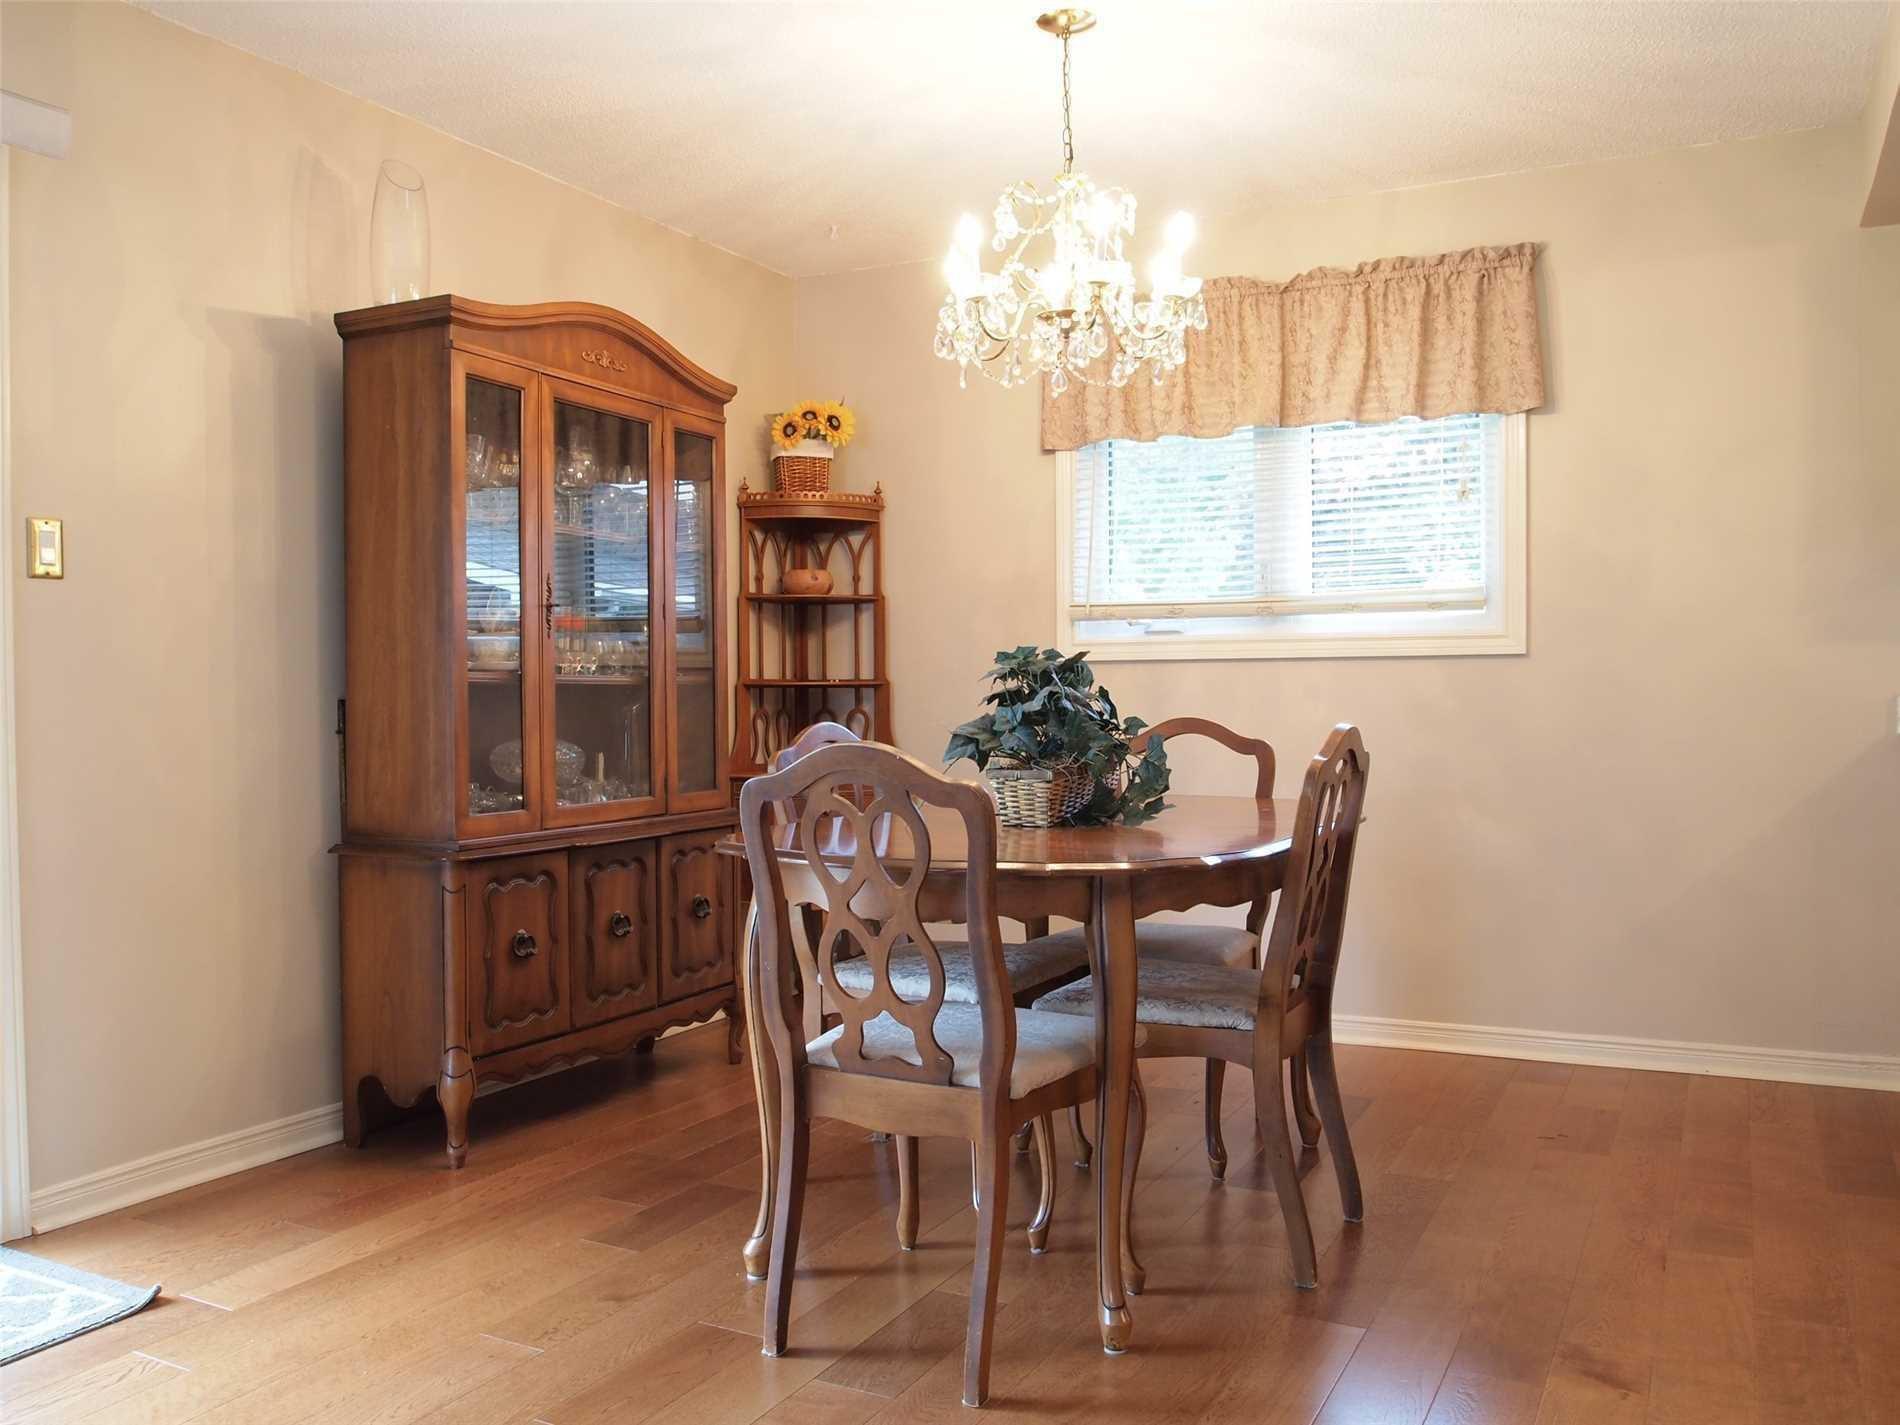 Photo 11: Photos: 105 Fifth Street in Brock: Beaverton House (Bungalow) for sale : MLS®# N4564596